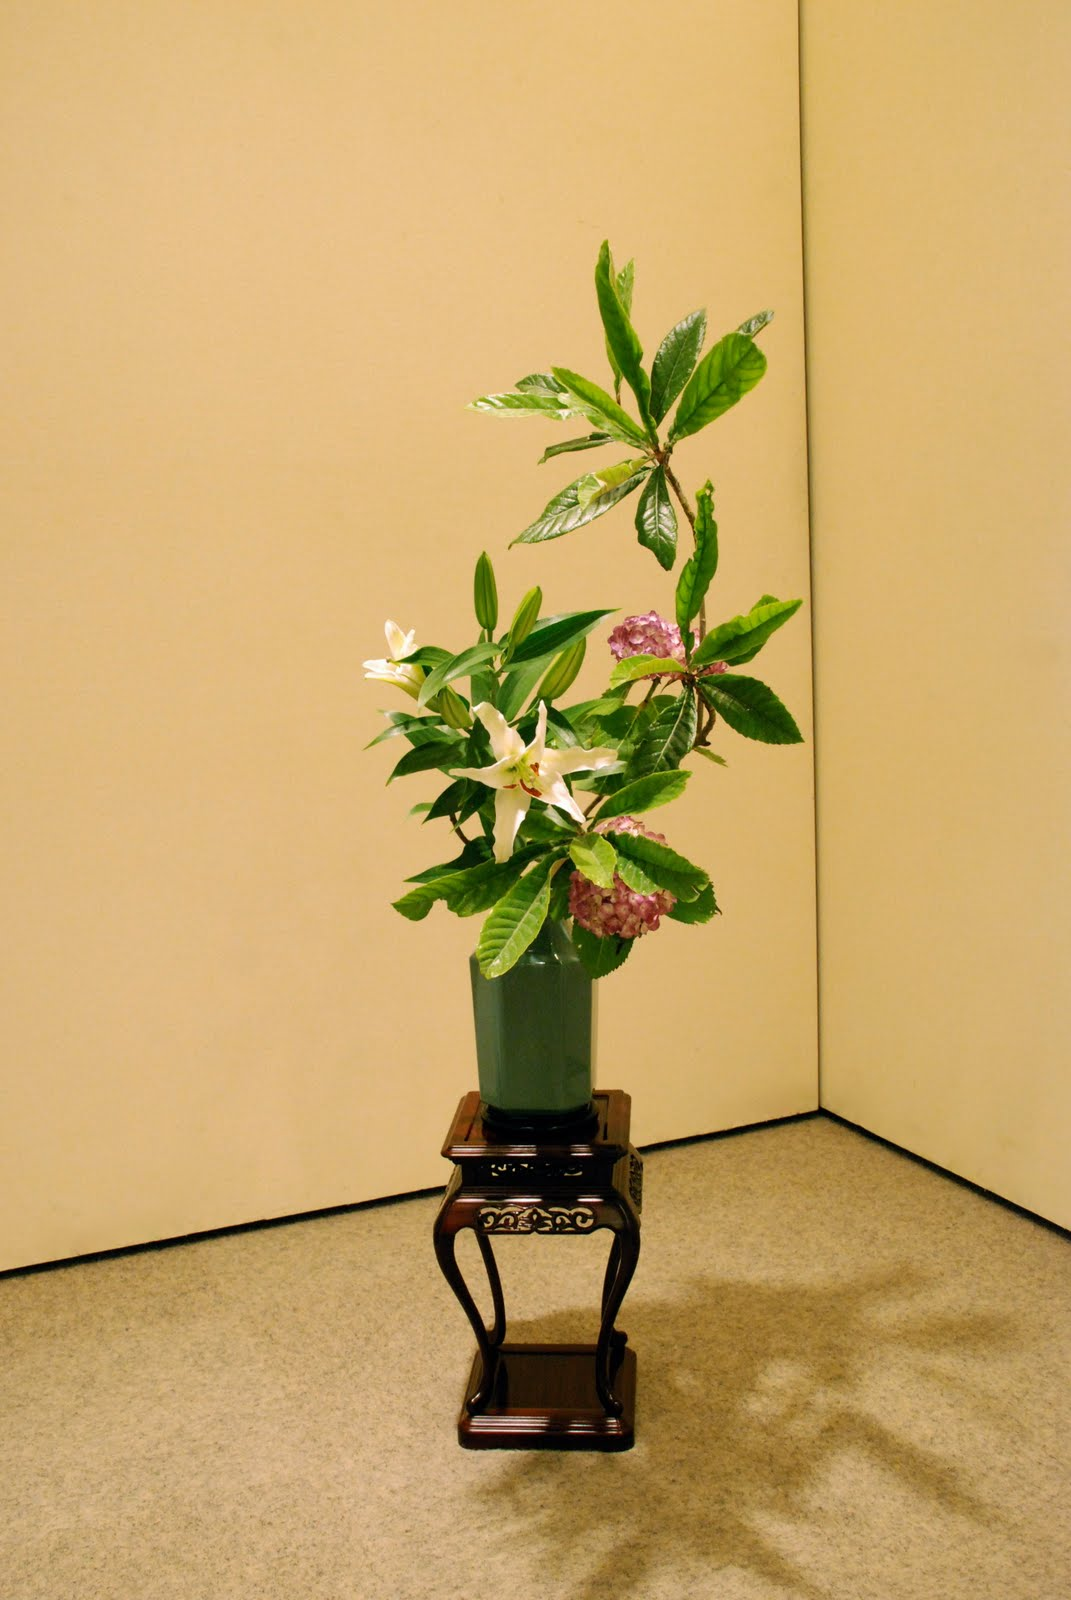 hanamai, the ikebana blog: 10 Years of Ikebana Asian Flower Arrangements